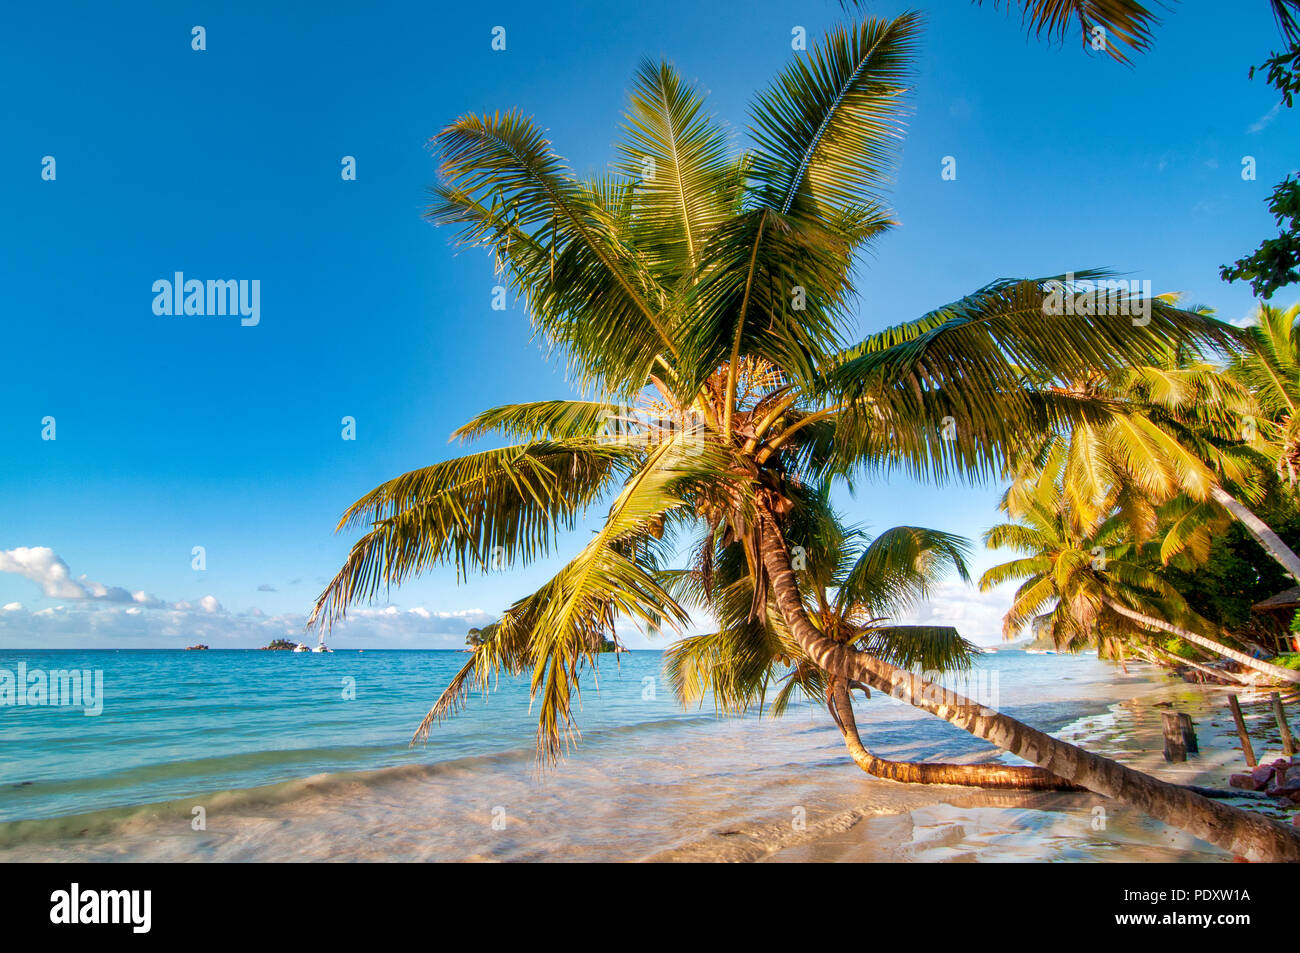 Koko-d-mer palm in Anse Volbert, Praslin, Seychelles - Stock Image